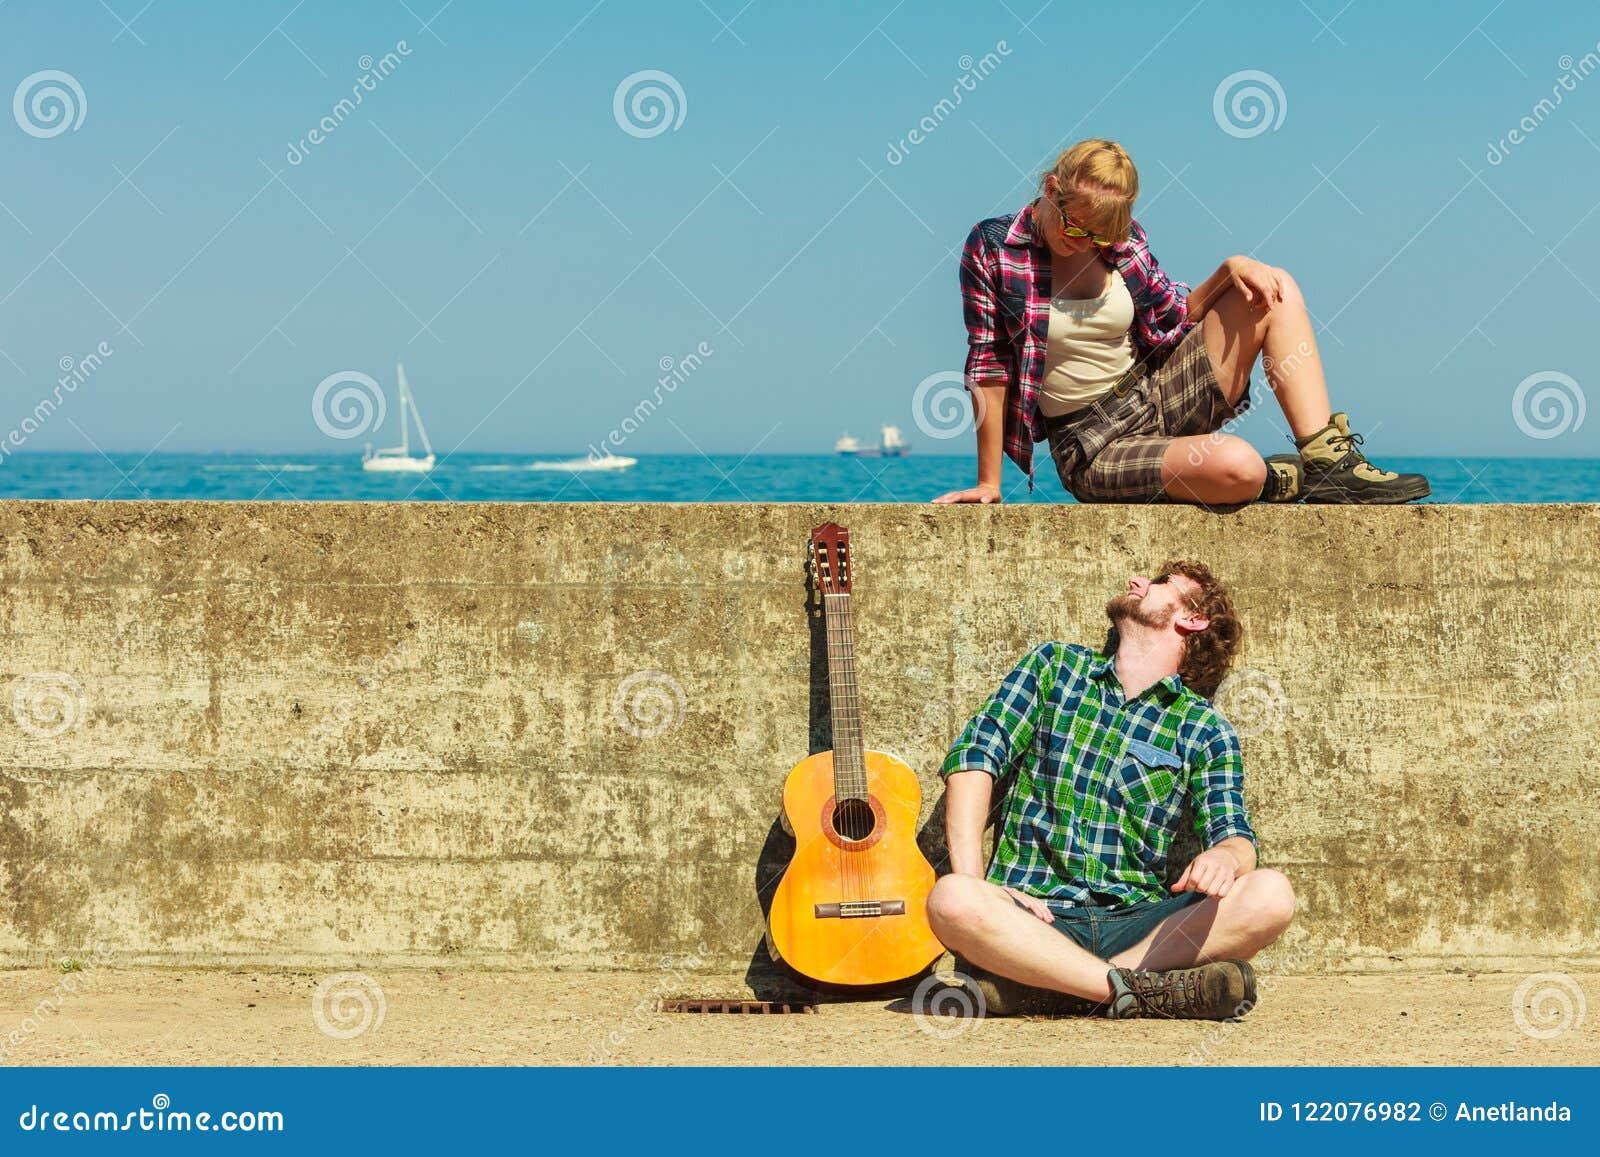 seaside dating tidlige dating tempo